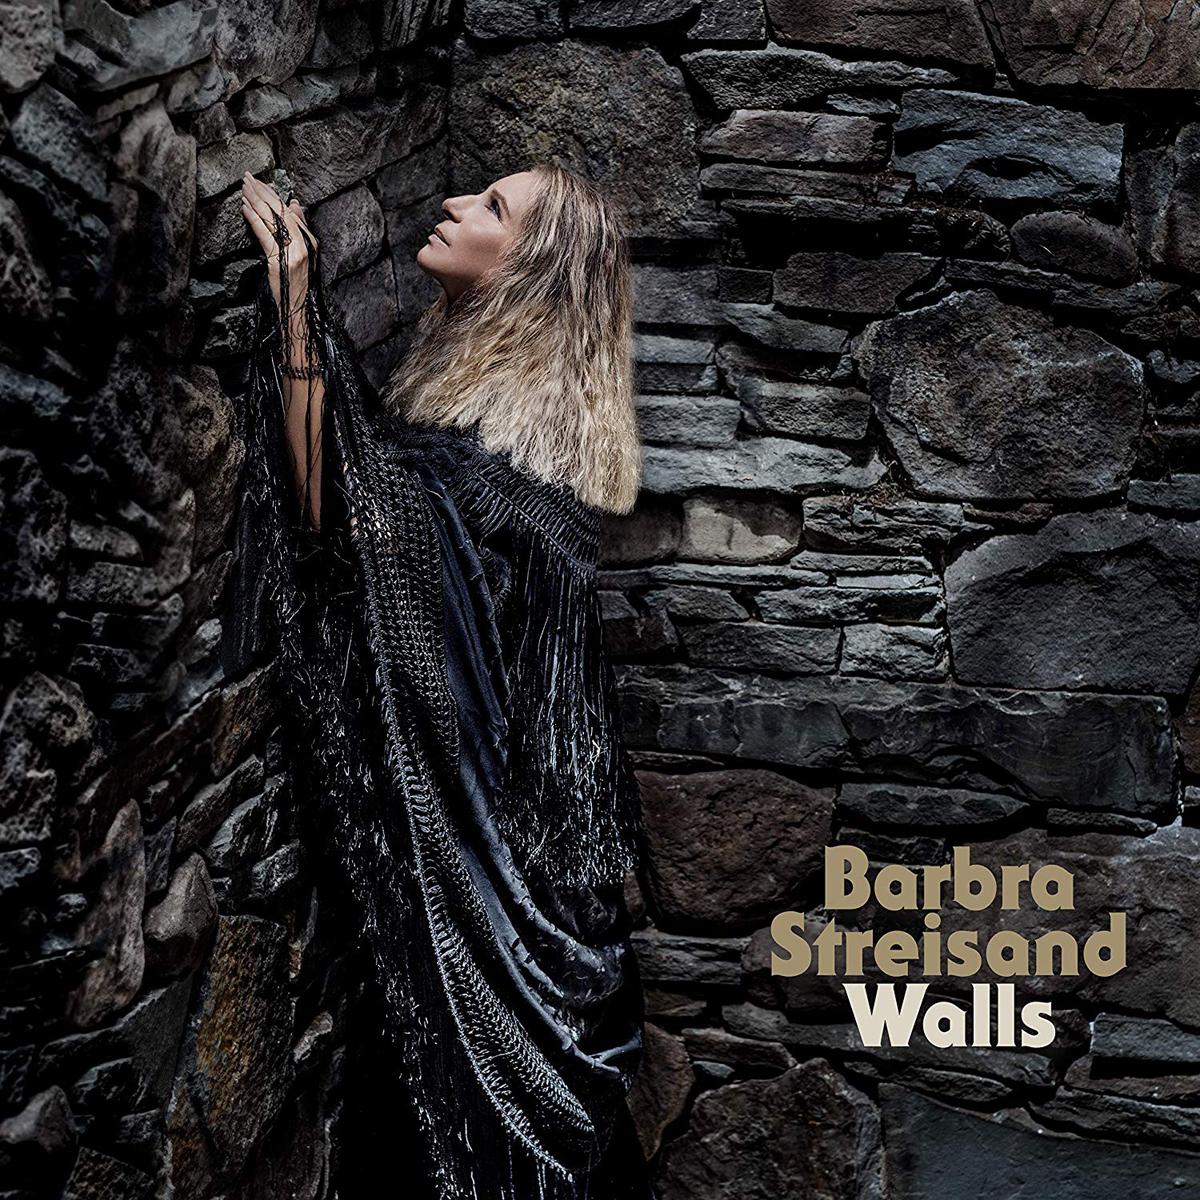 Барбра Стрейзанд Barbra Streisand. Walls (LP) barbra streisand barbra streisand partners 2 lp cd